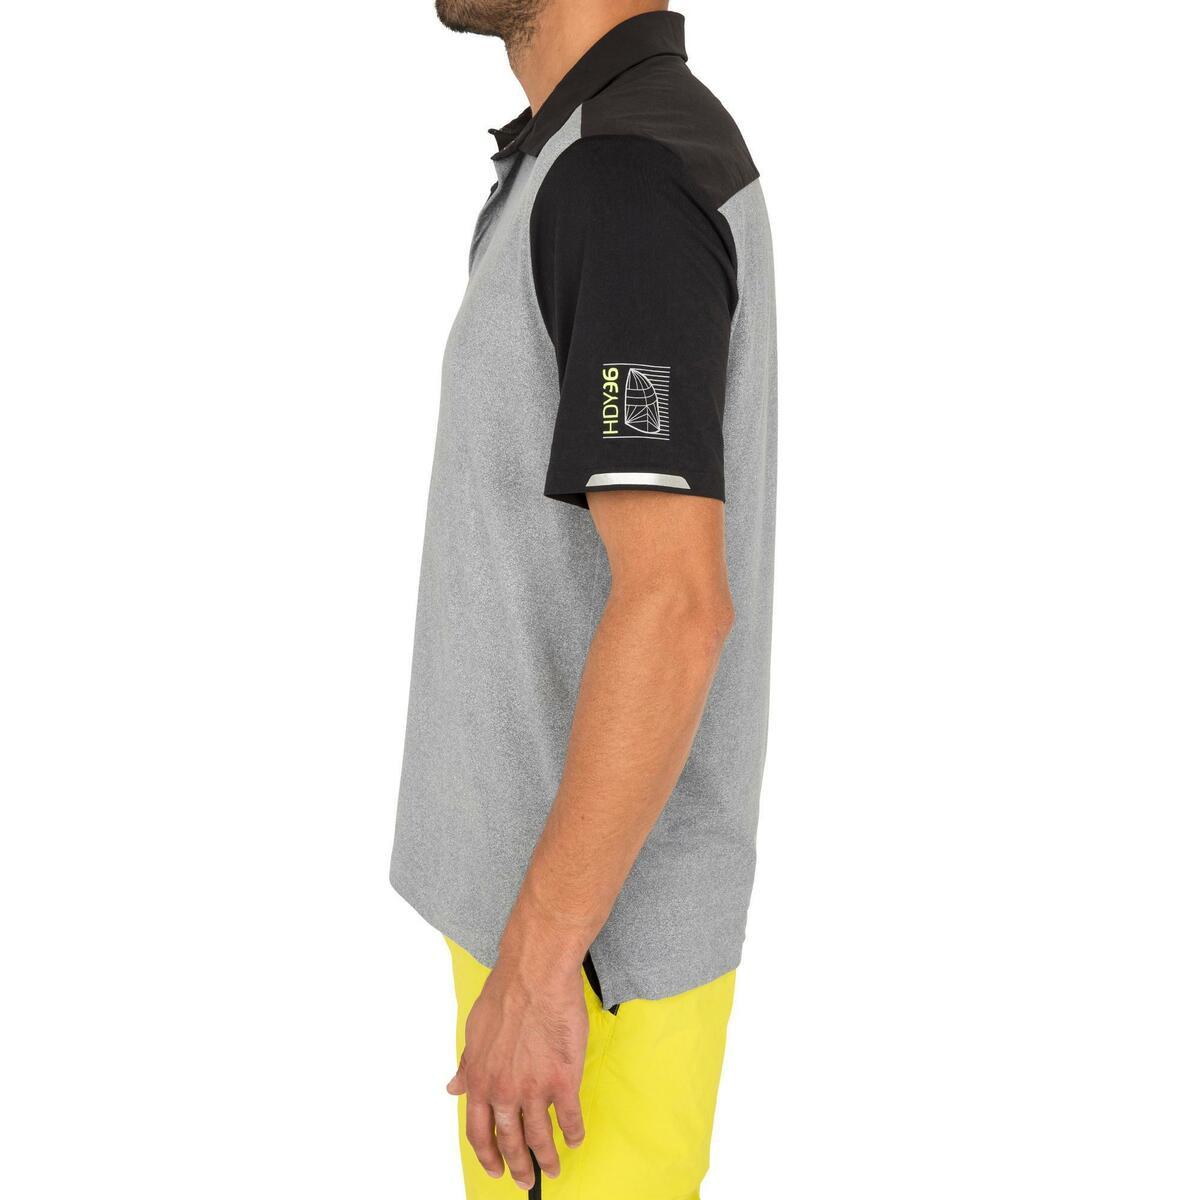 Bild 4 von Poloshirt kurzarm Segeln Race Herren grau meliert